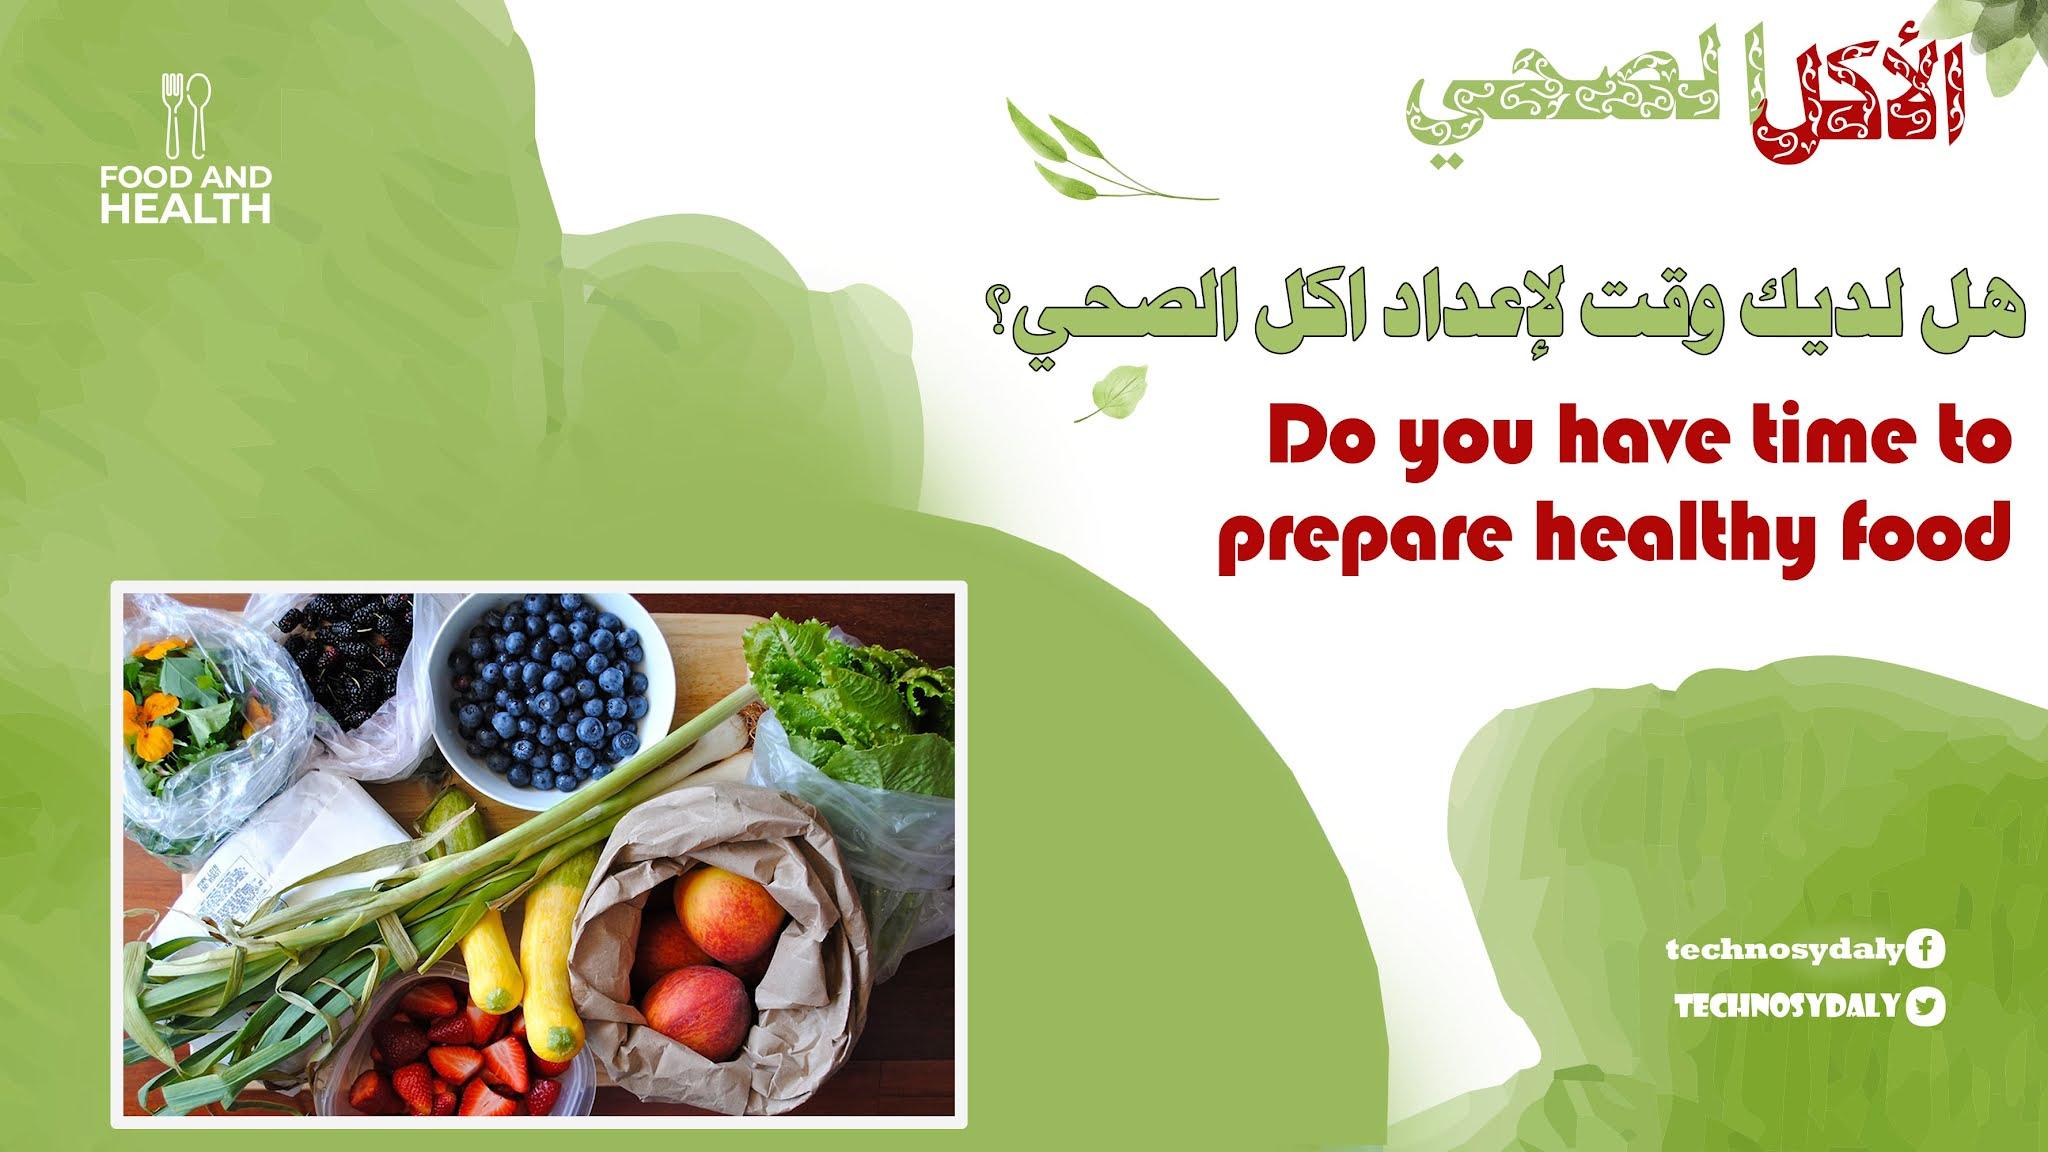 هل لديك وقت لإعداد اكل الصحي؟ Do you have time to prepare healthy food